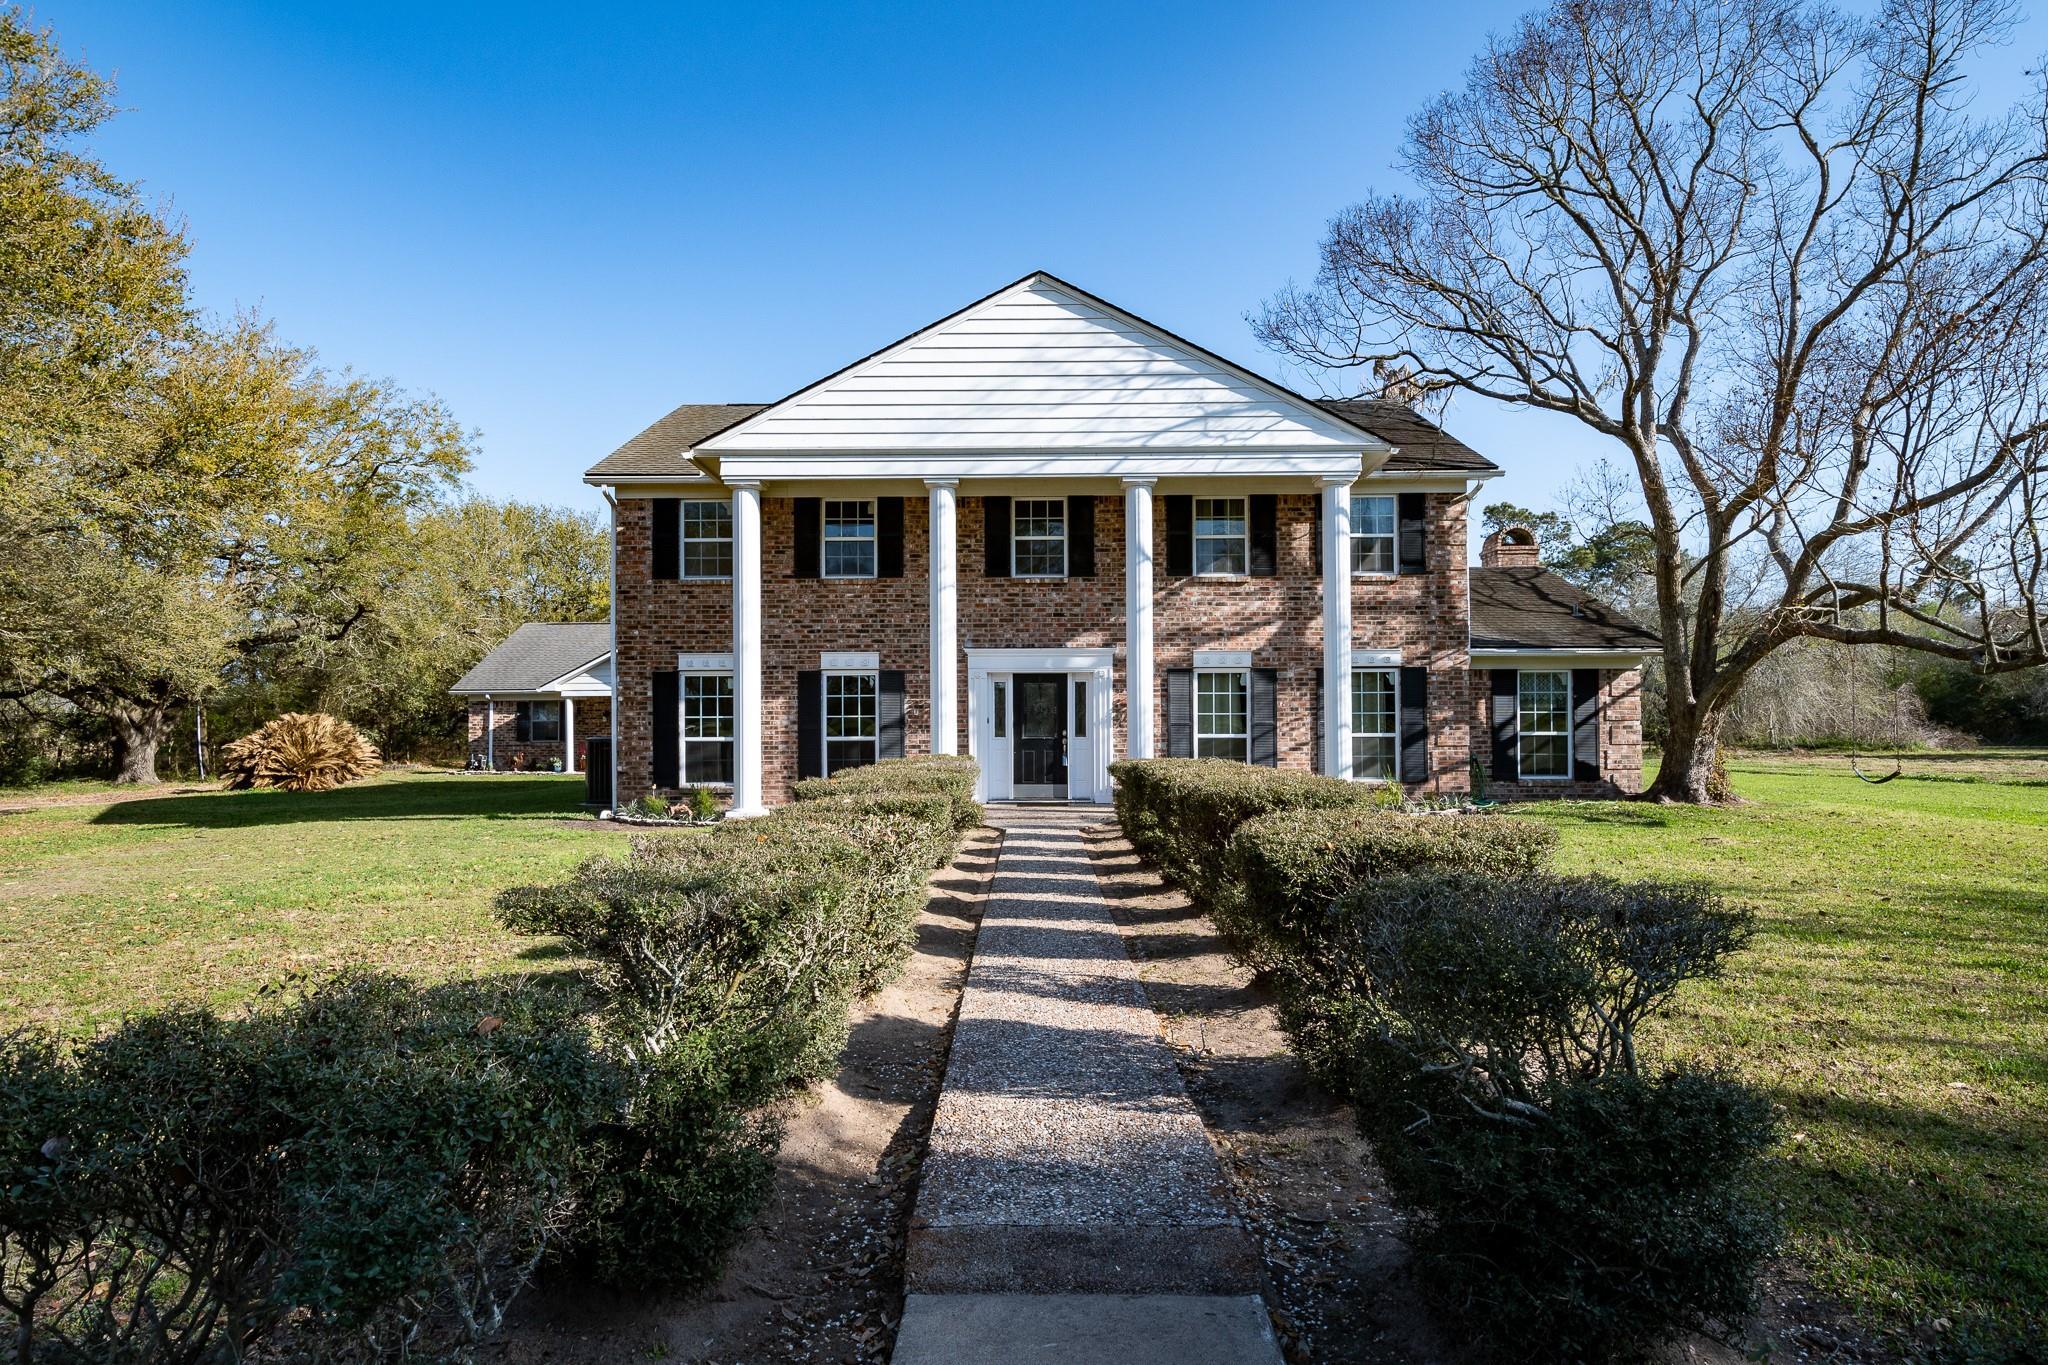 1425 FM 2936 Property Photo - Anahuac, TX real estate listing